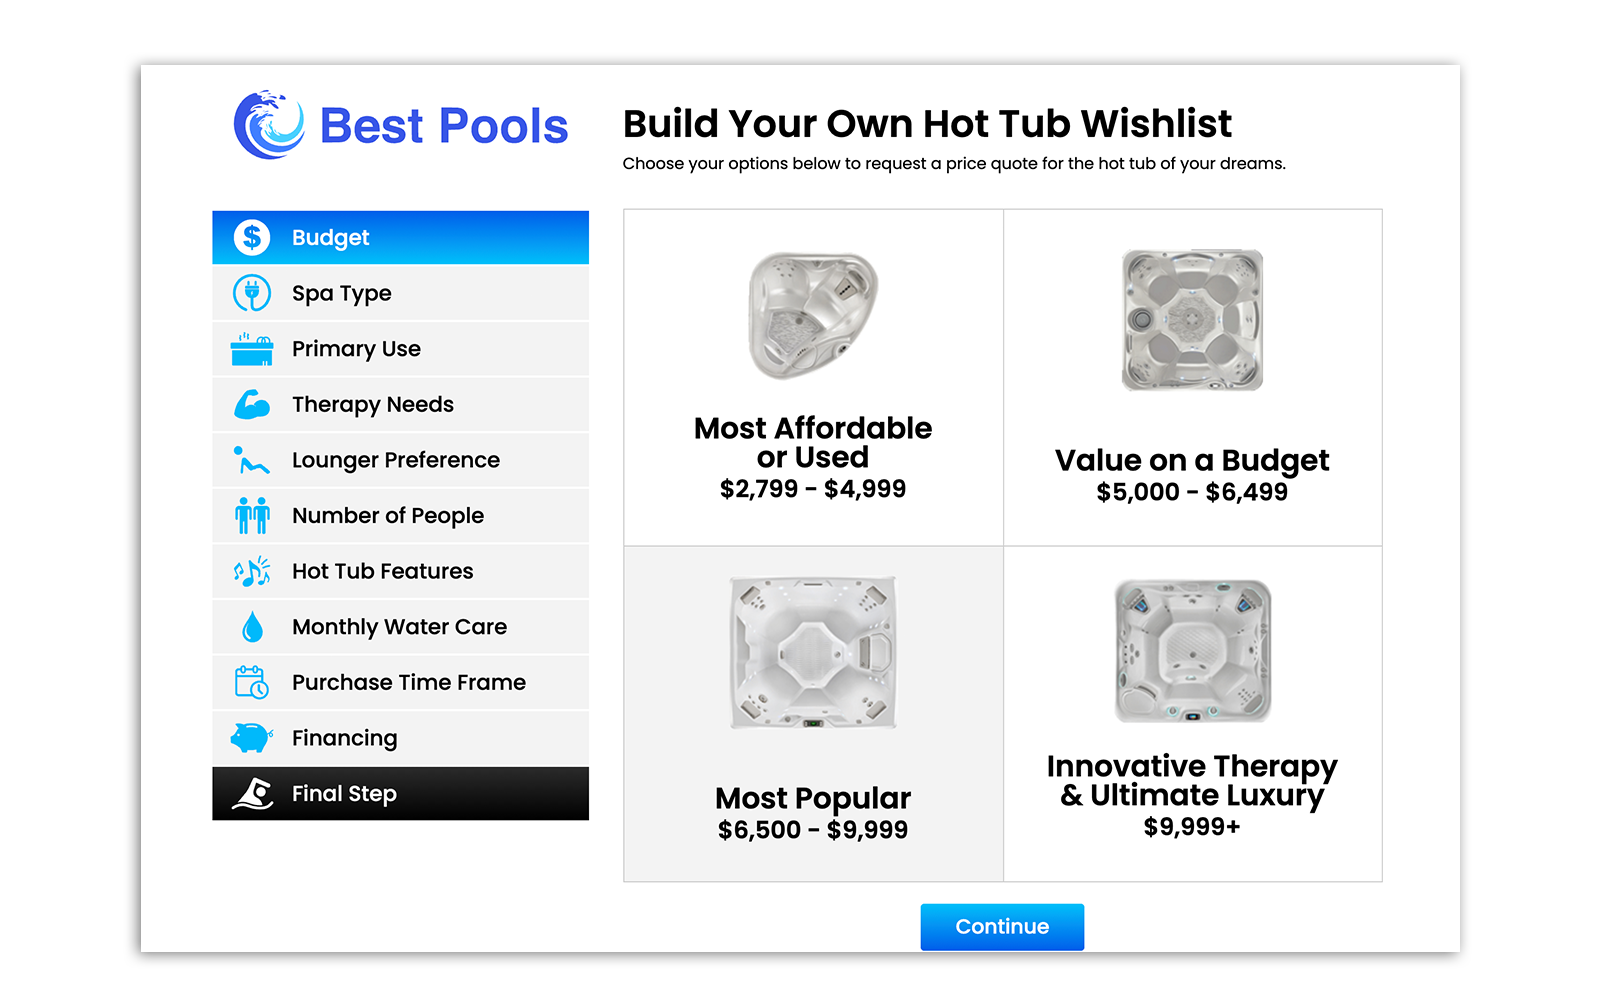 Build Your Own Hot Tub Wishlist